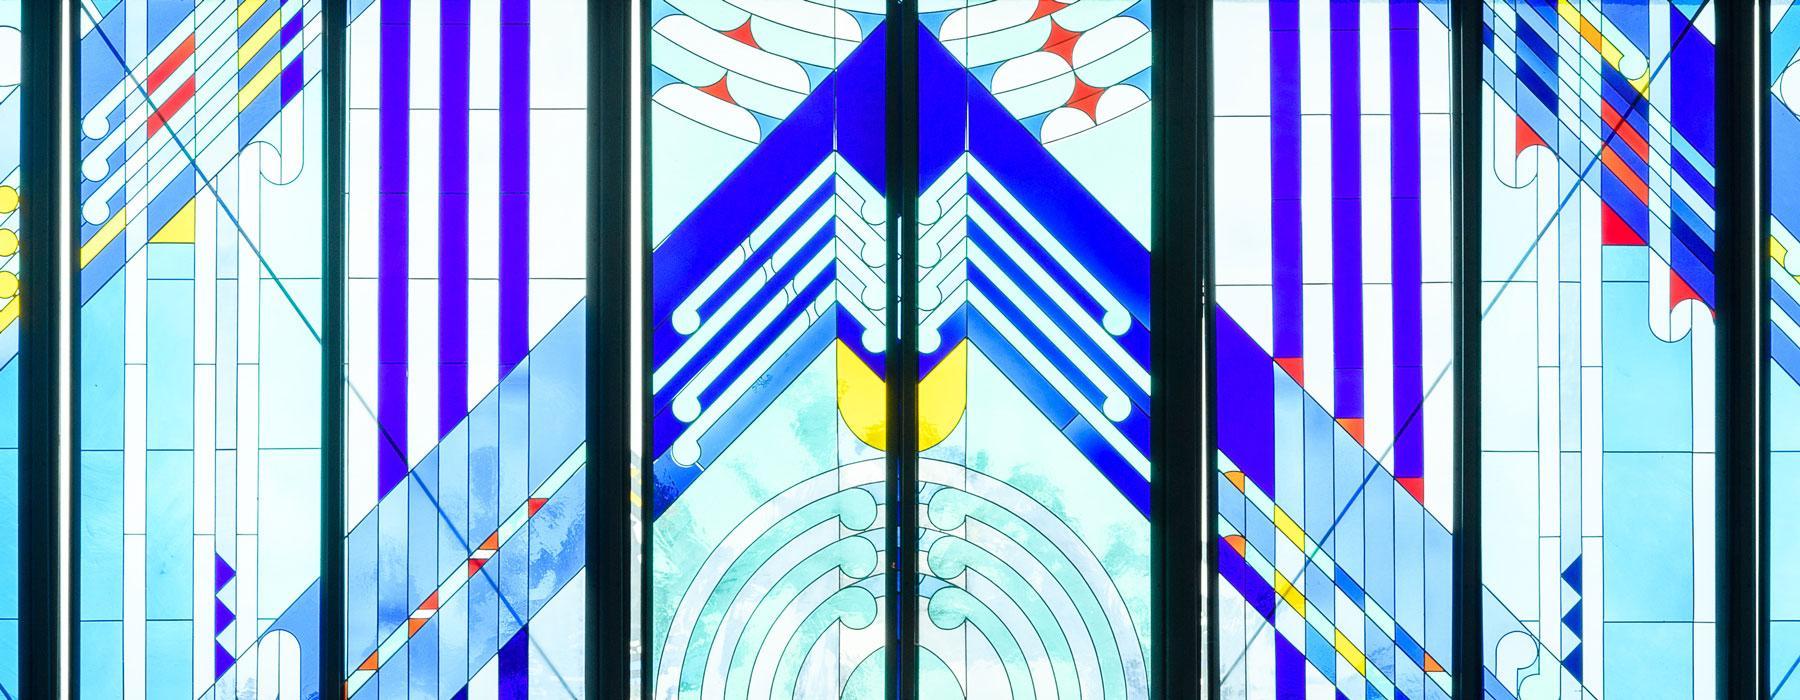 Detail of the windows in Te Marae